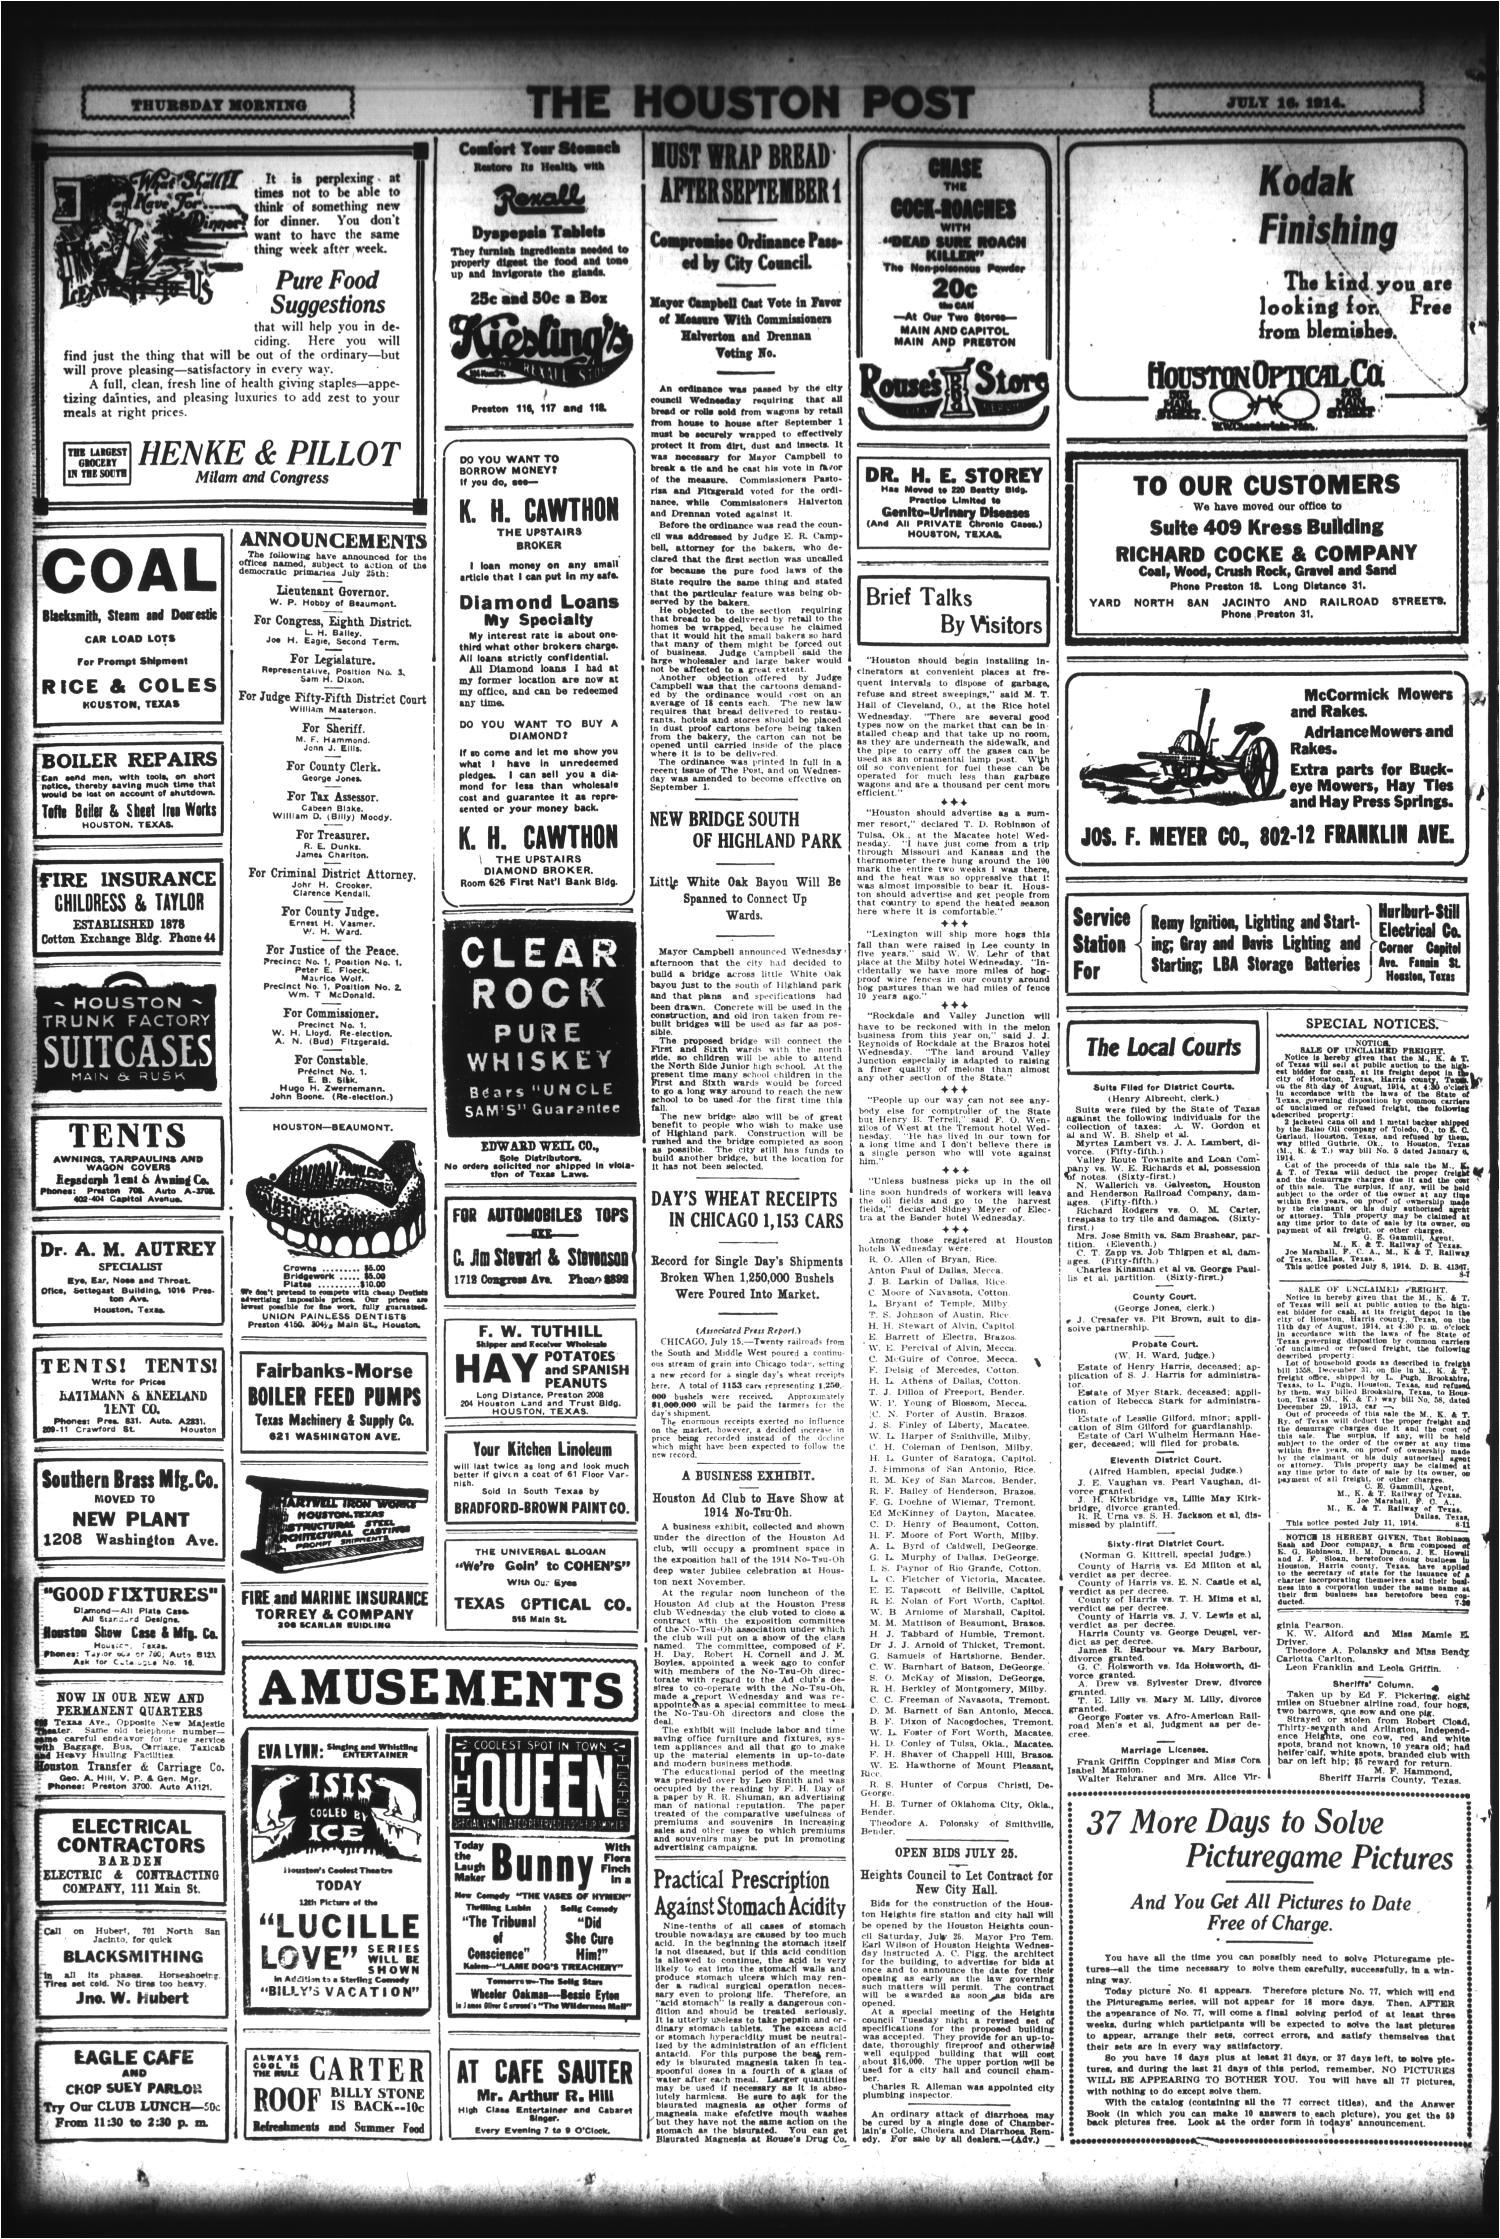 the houston post houston tex vol 29 no 103 ed 1 thursday july 16 1914 page 16 of 16 the portal to texas history